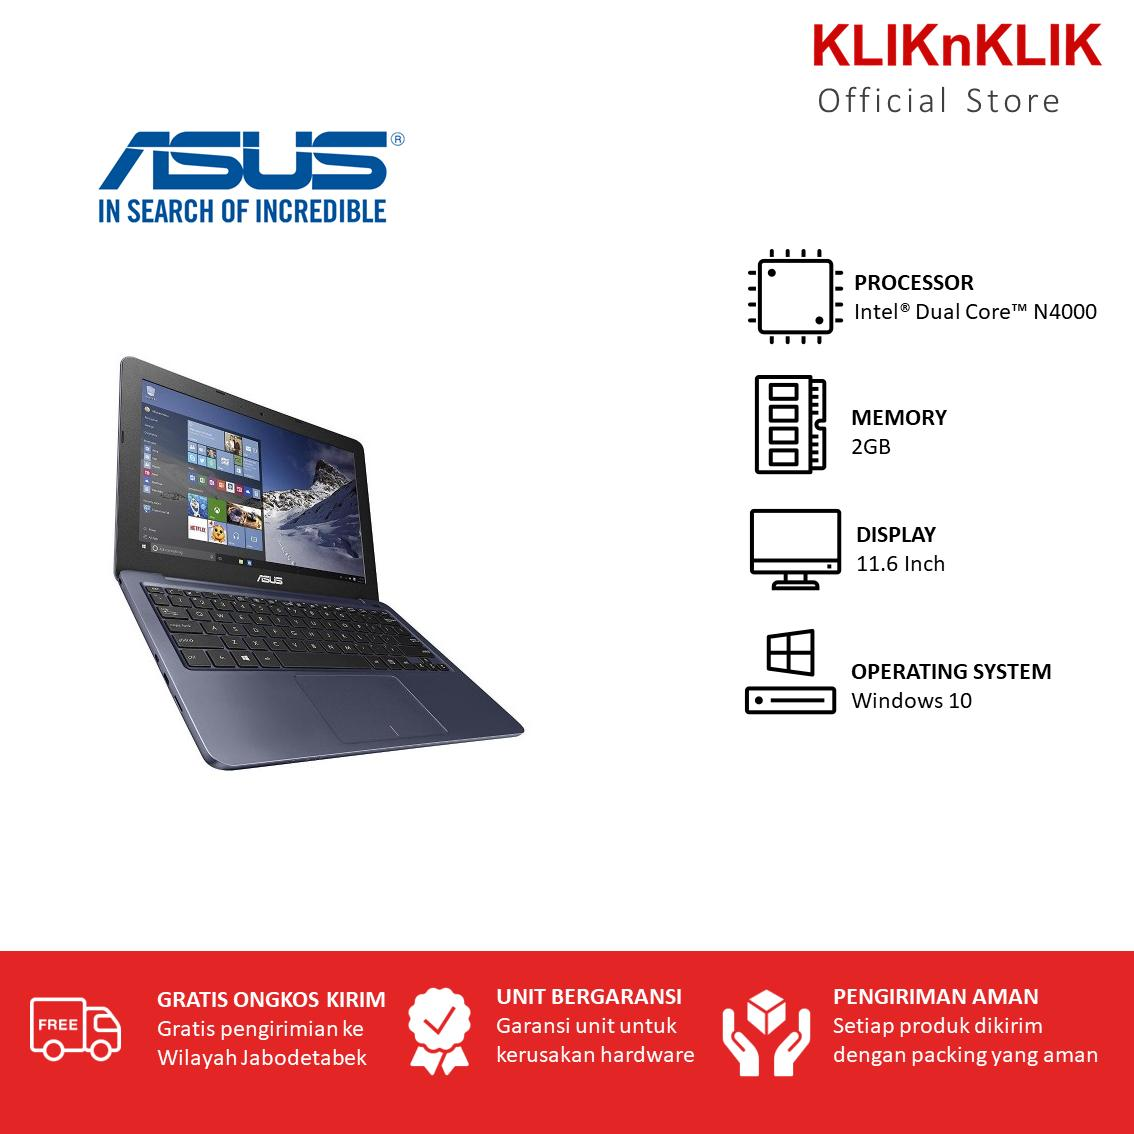 ASUS E203MAH-FD011T-Celeron DualCore N4000-2GB-11.6-win10-abu-abu